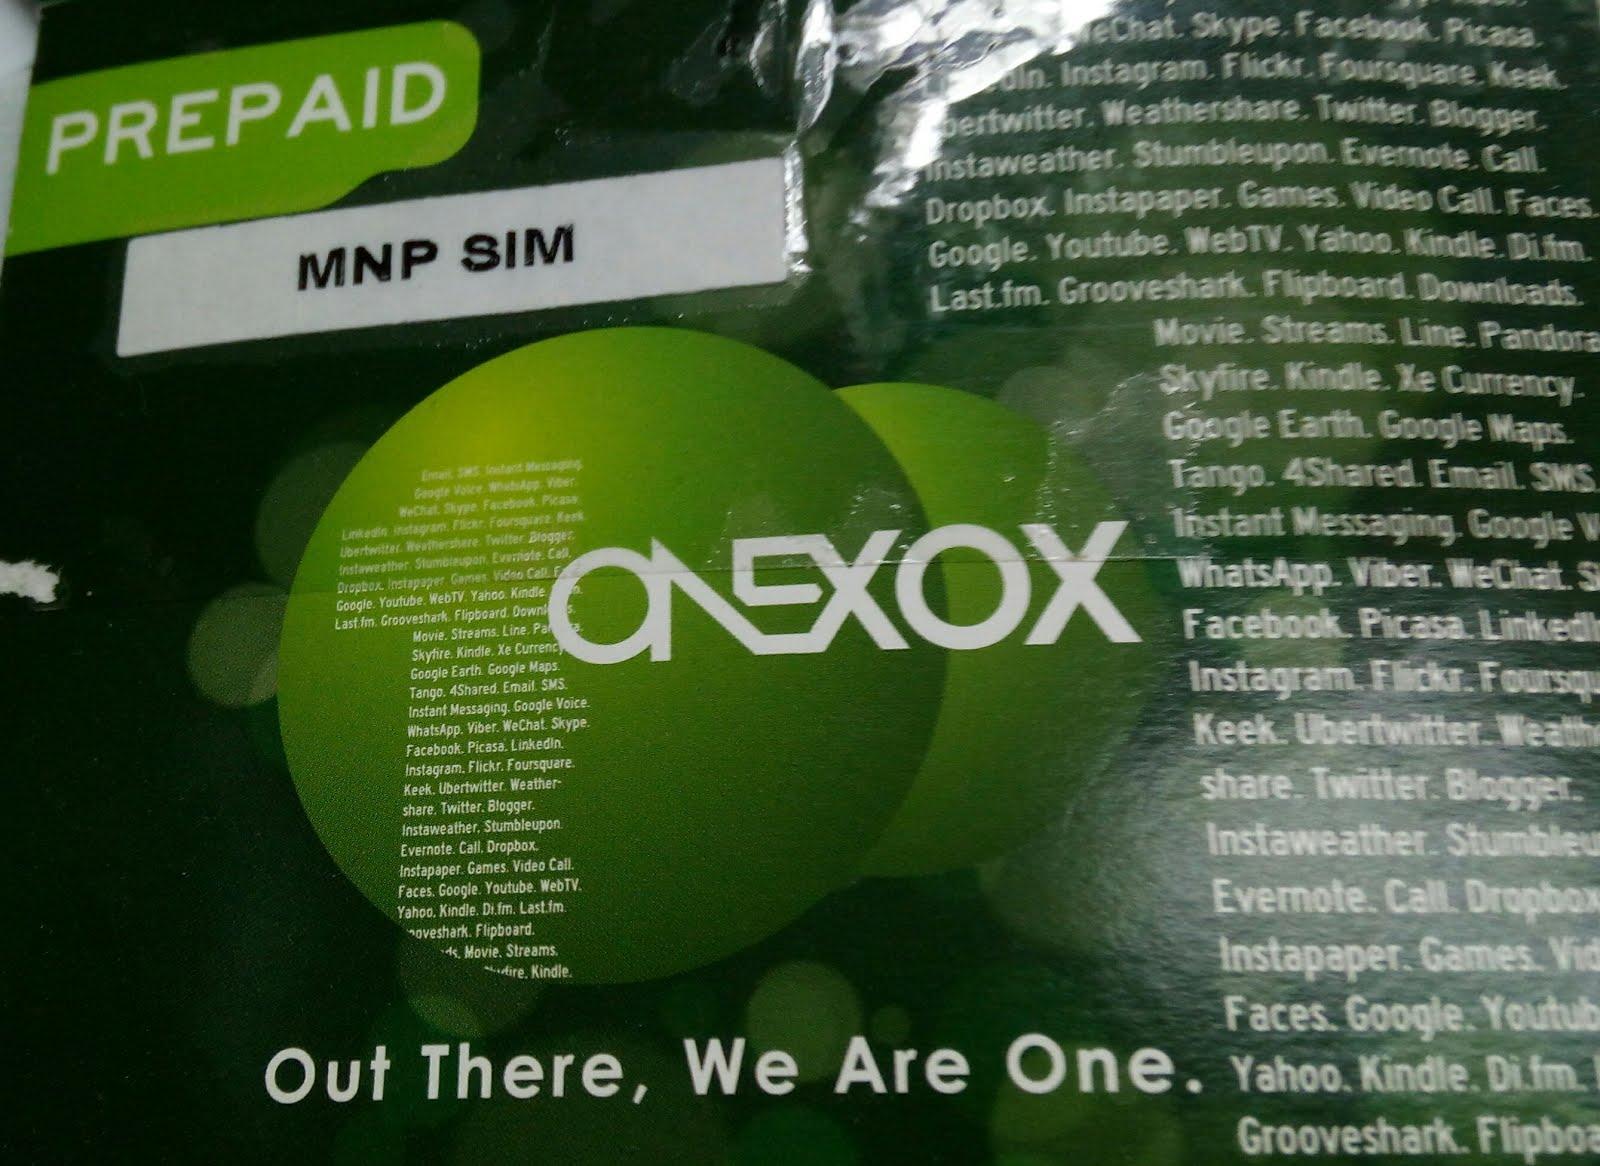 Cara Nak Transfer Kredit Ma Ke Nombor Xox Servis Prepaid Online Pindah Kredit0